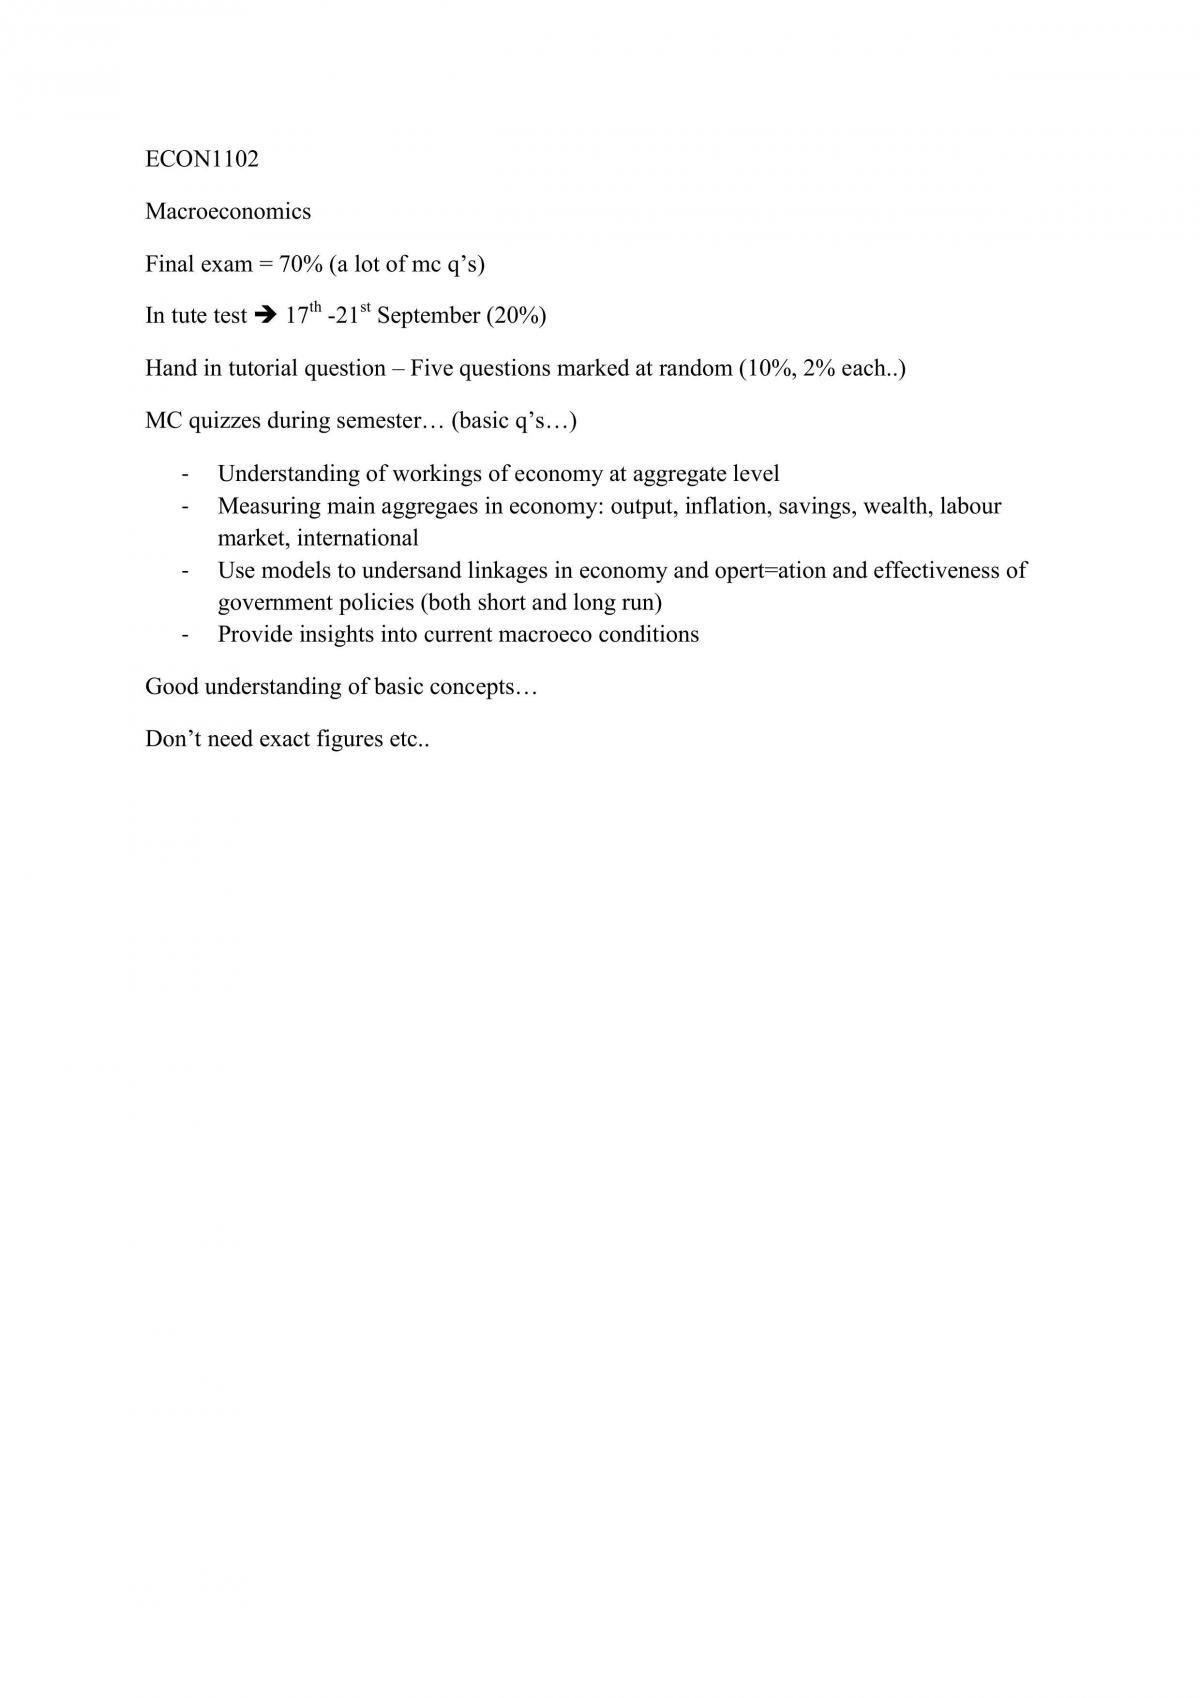 Macroeconomics Full Study Notes - Page 1